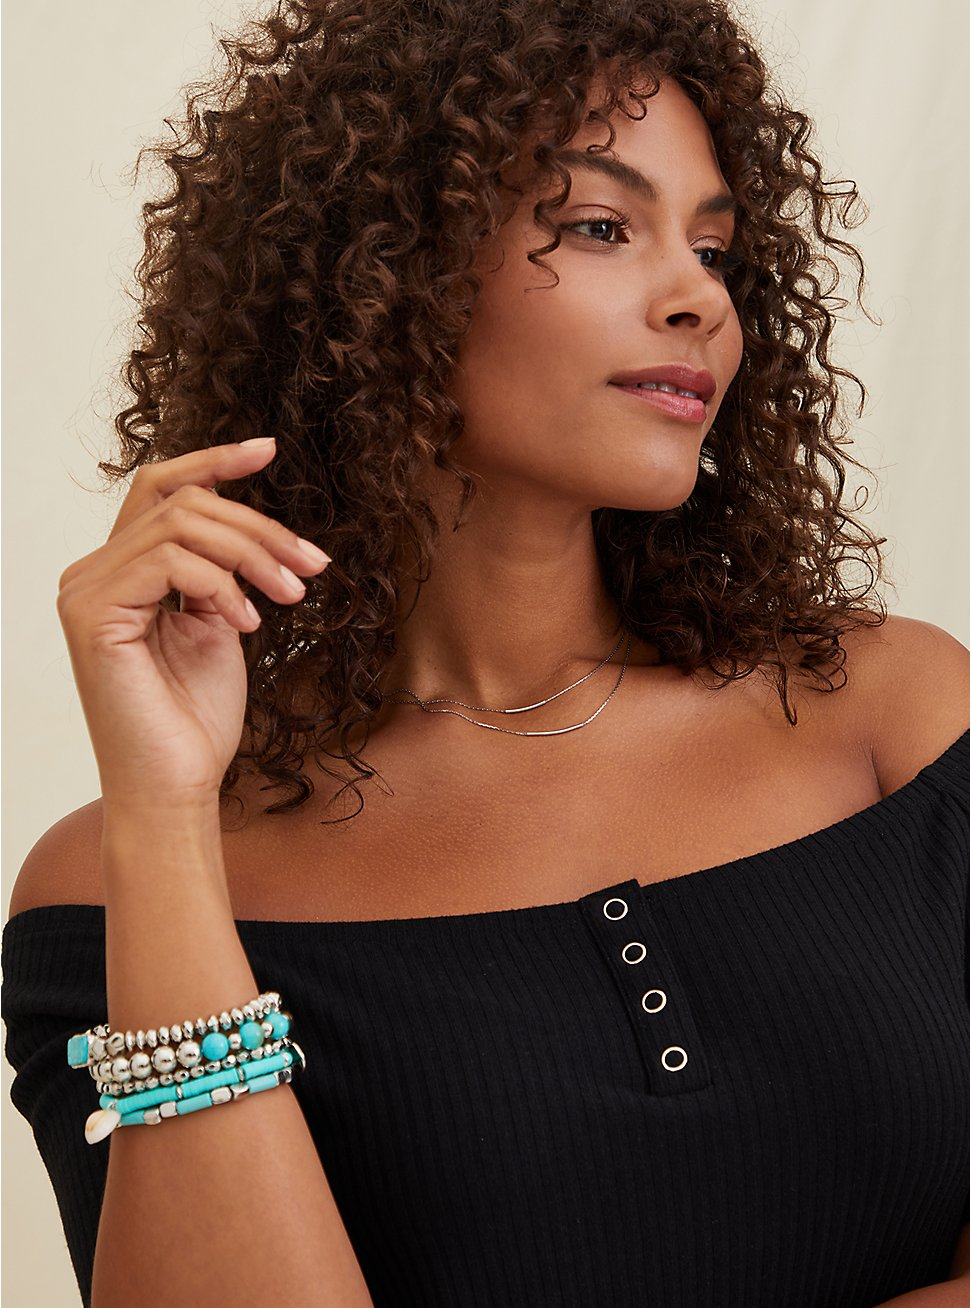 Silver-Tone & Turquoise Beaded Bracelet Set - Set of 5, TURQUOISE, hi-res